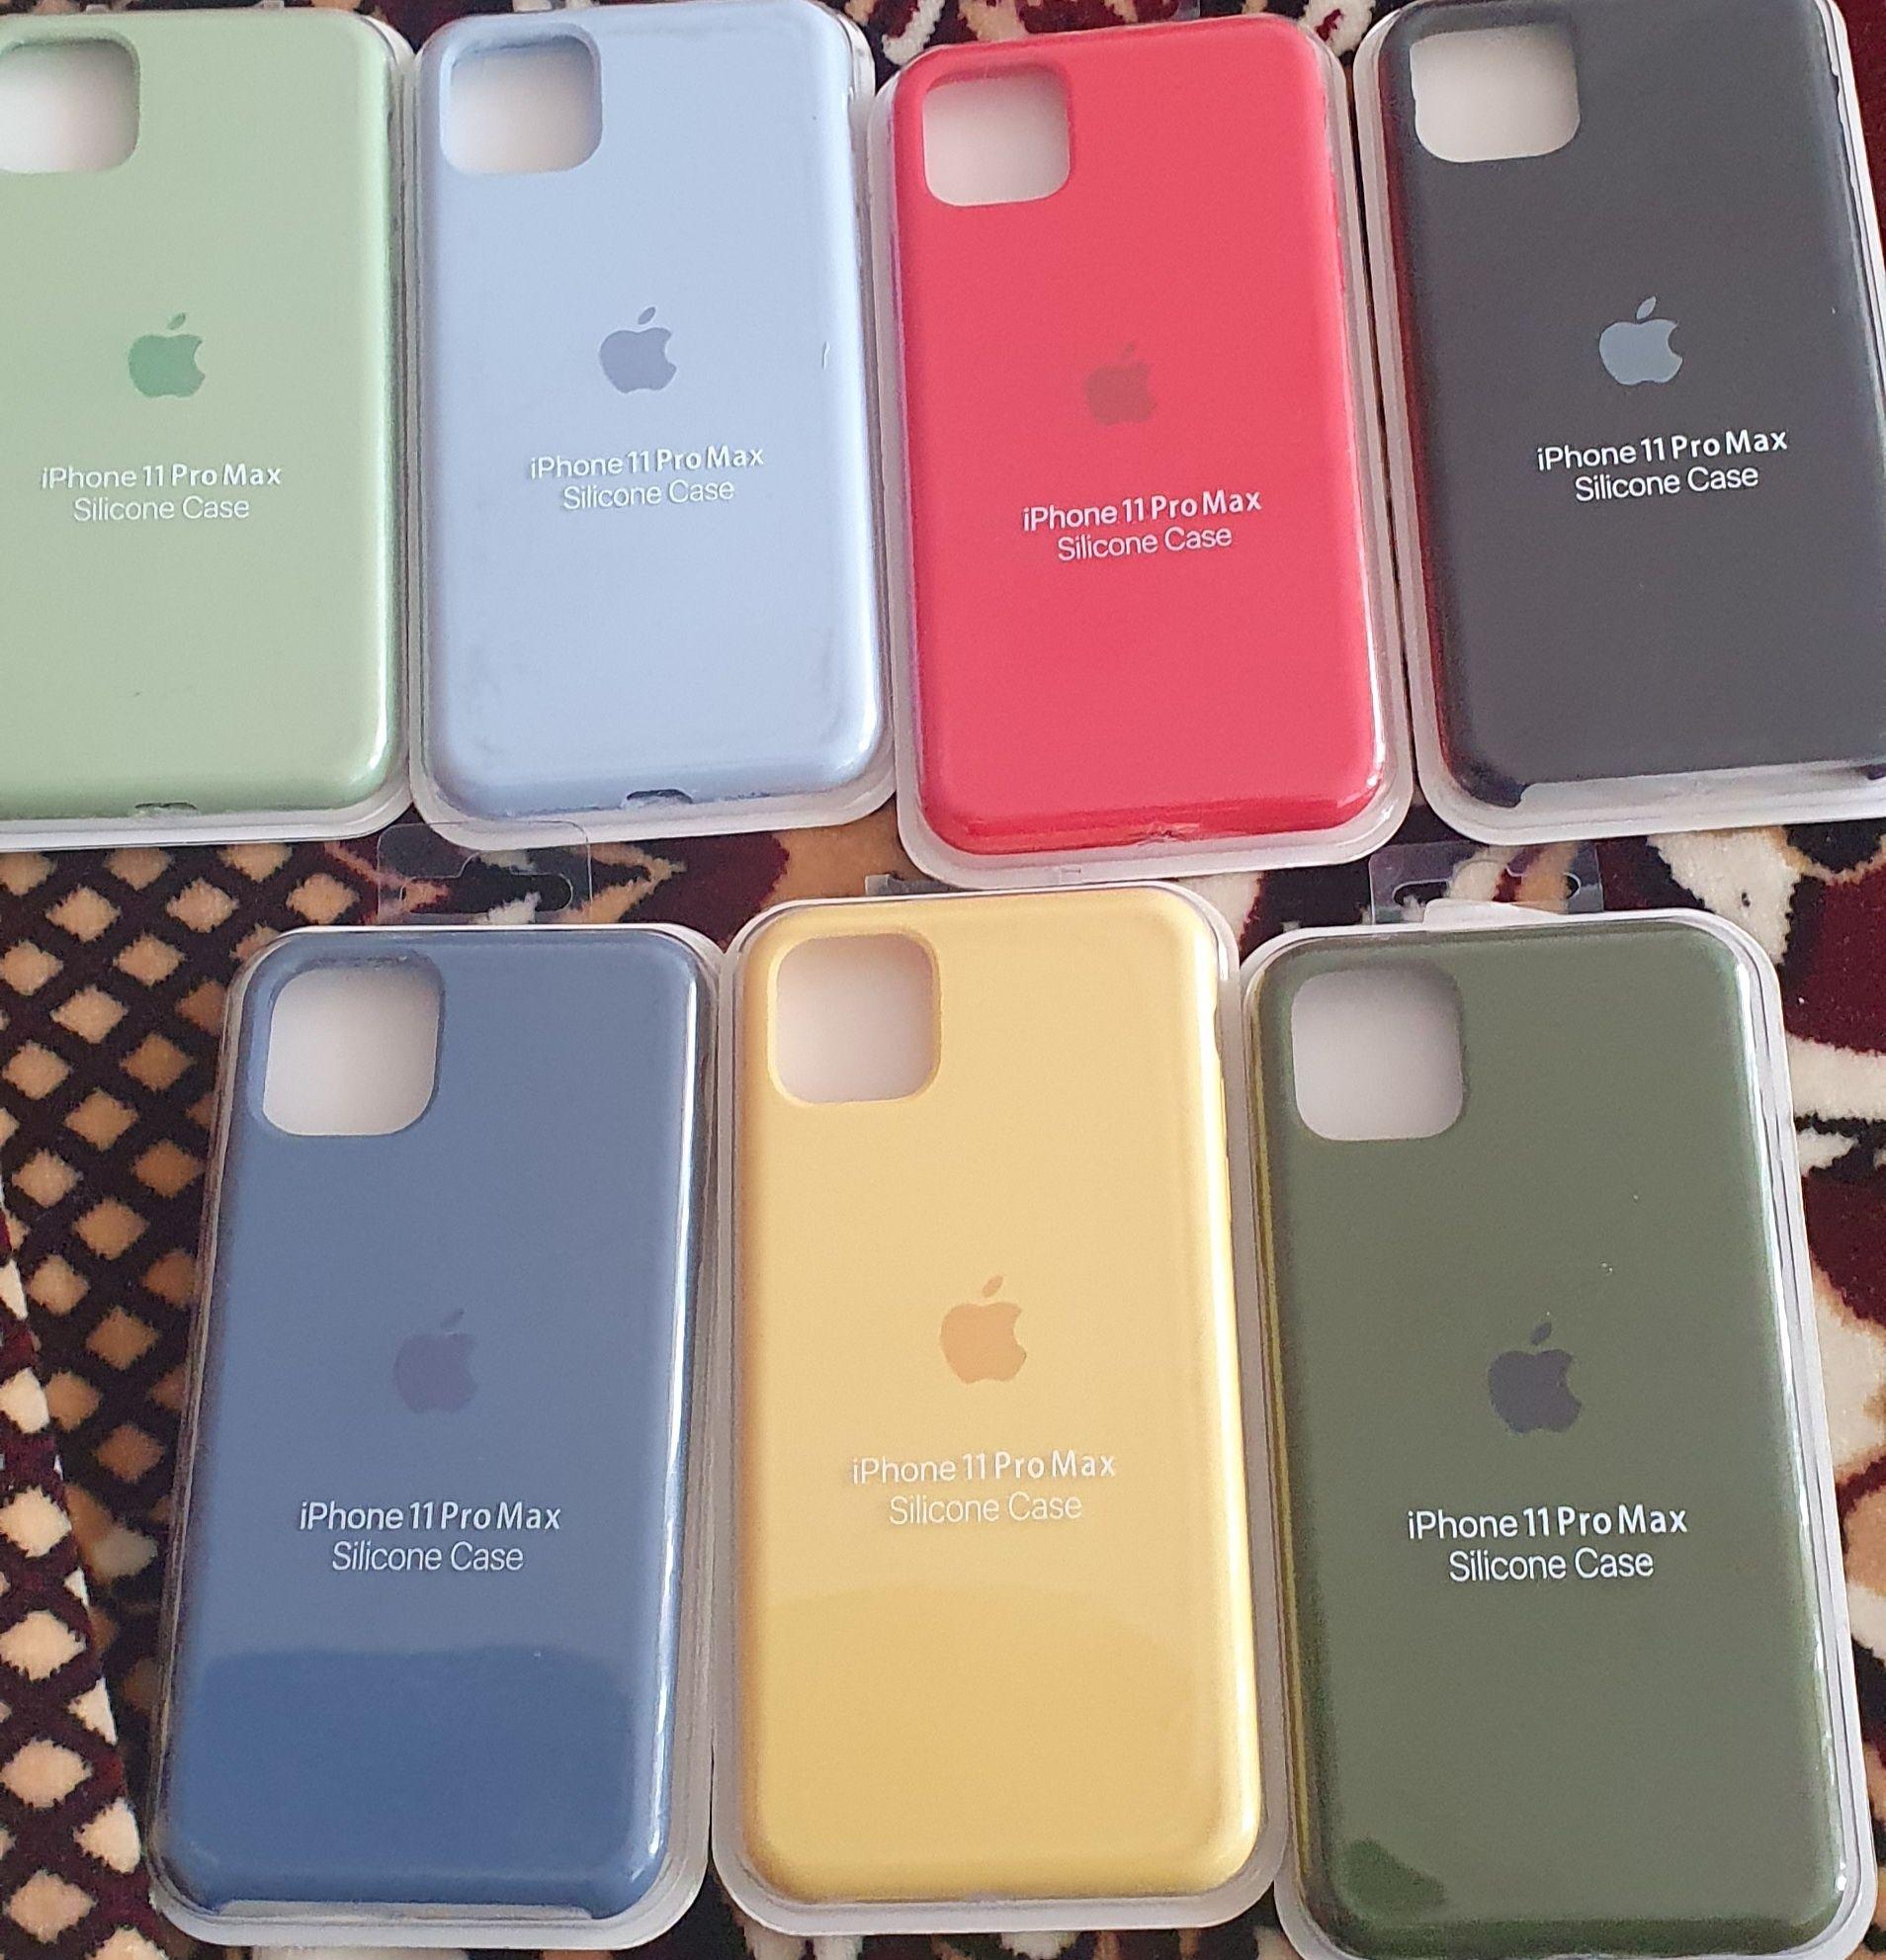 Husa silicon Apple iPhone 6 6s 7 8 plus X XR XS 11 12 PRO MAX